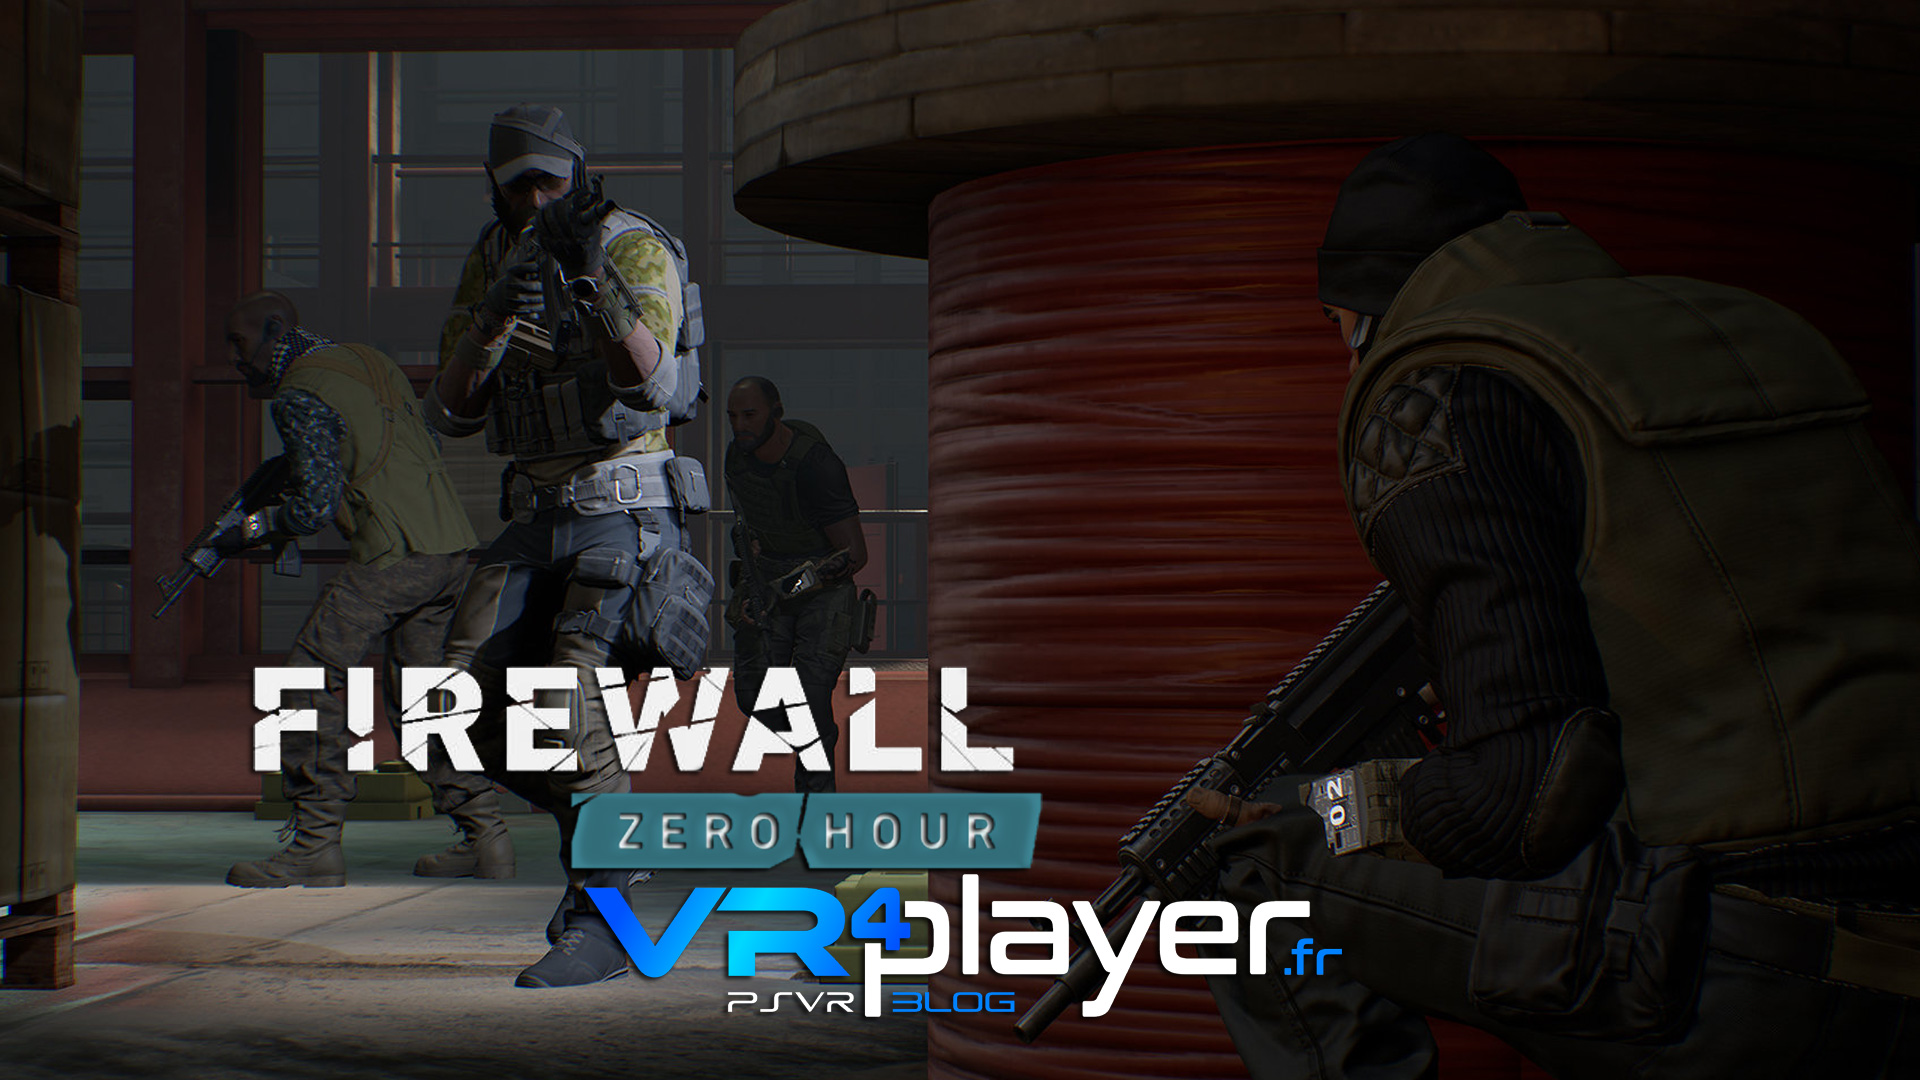 Firewall Zero Hour PSVR vr4player.fr